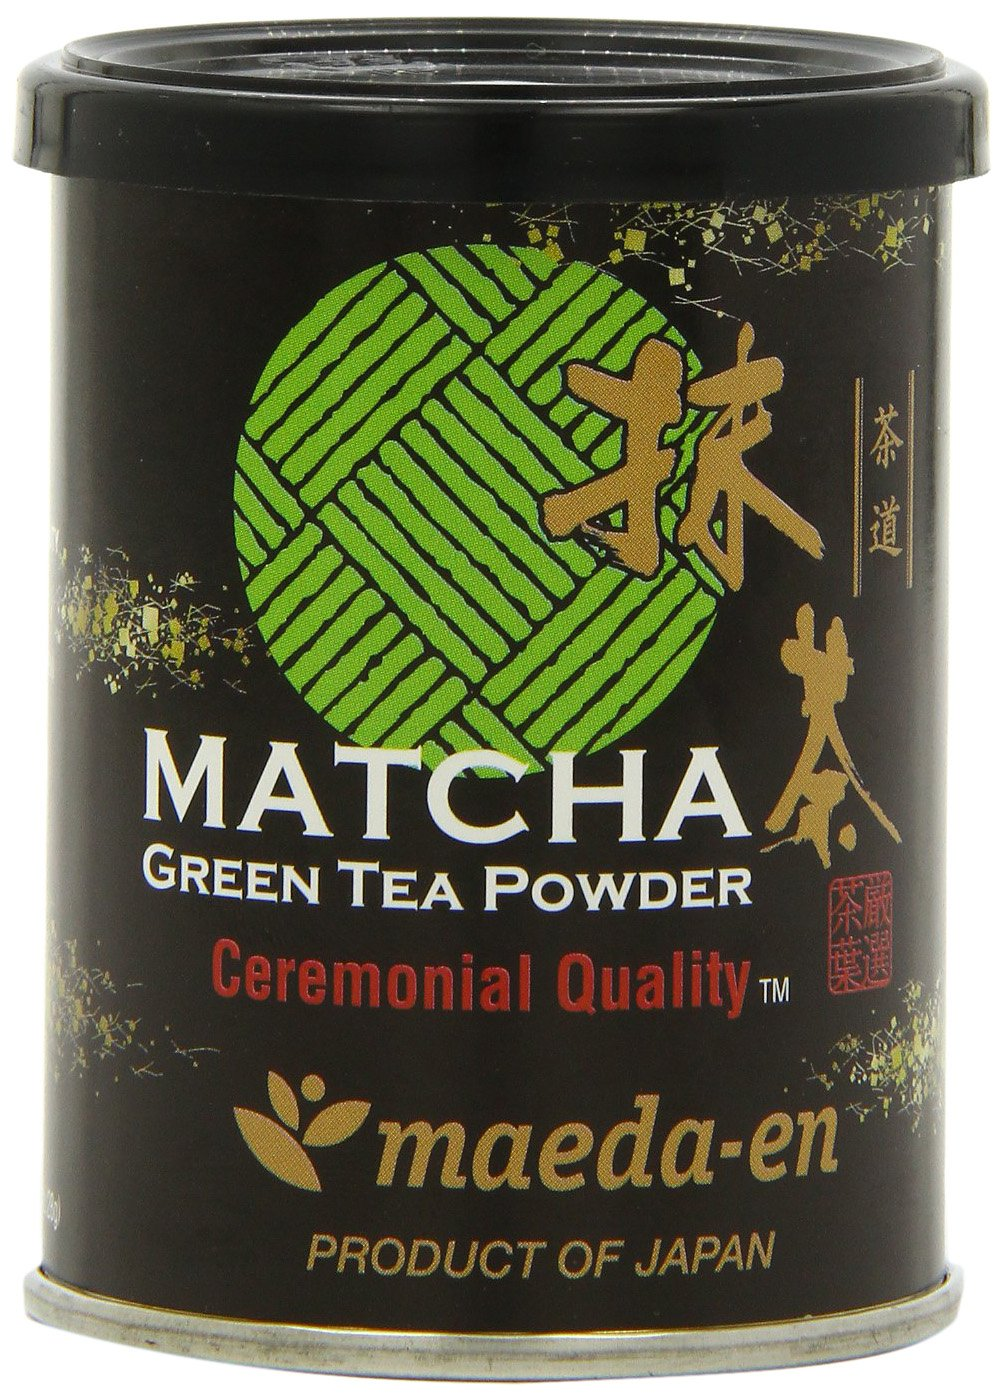 Maeda-En Matcha Ceremonial Quality Green Tea Powder, 1-Ounce by MAEDA-EN